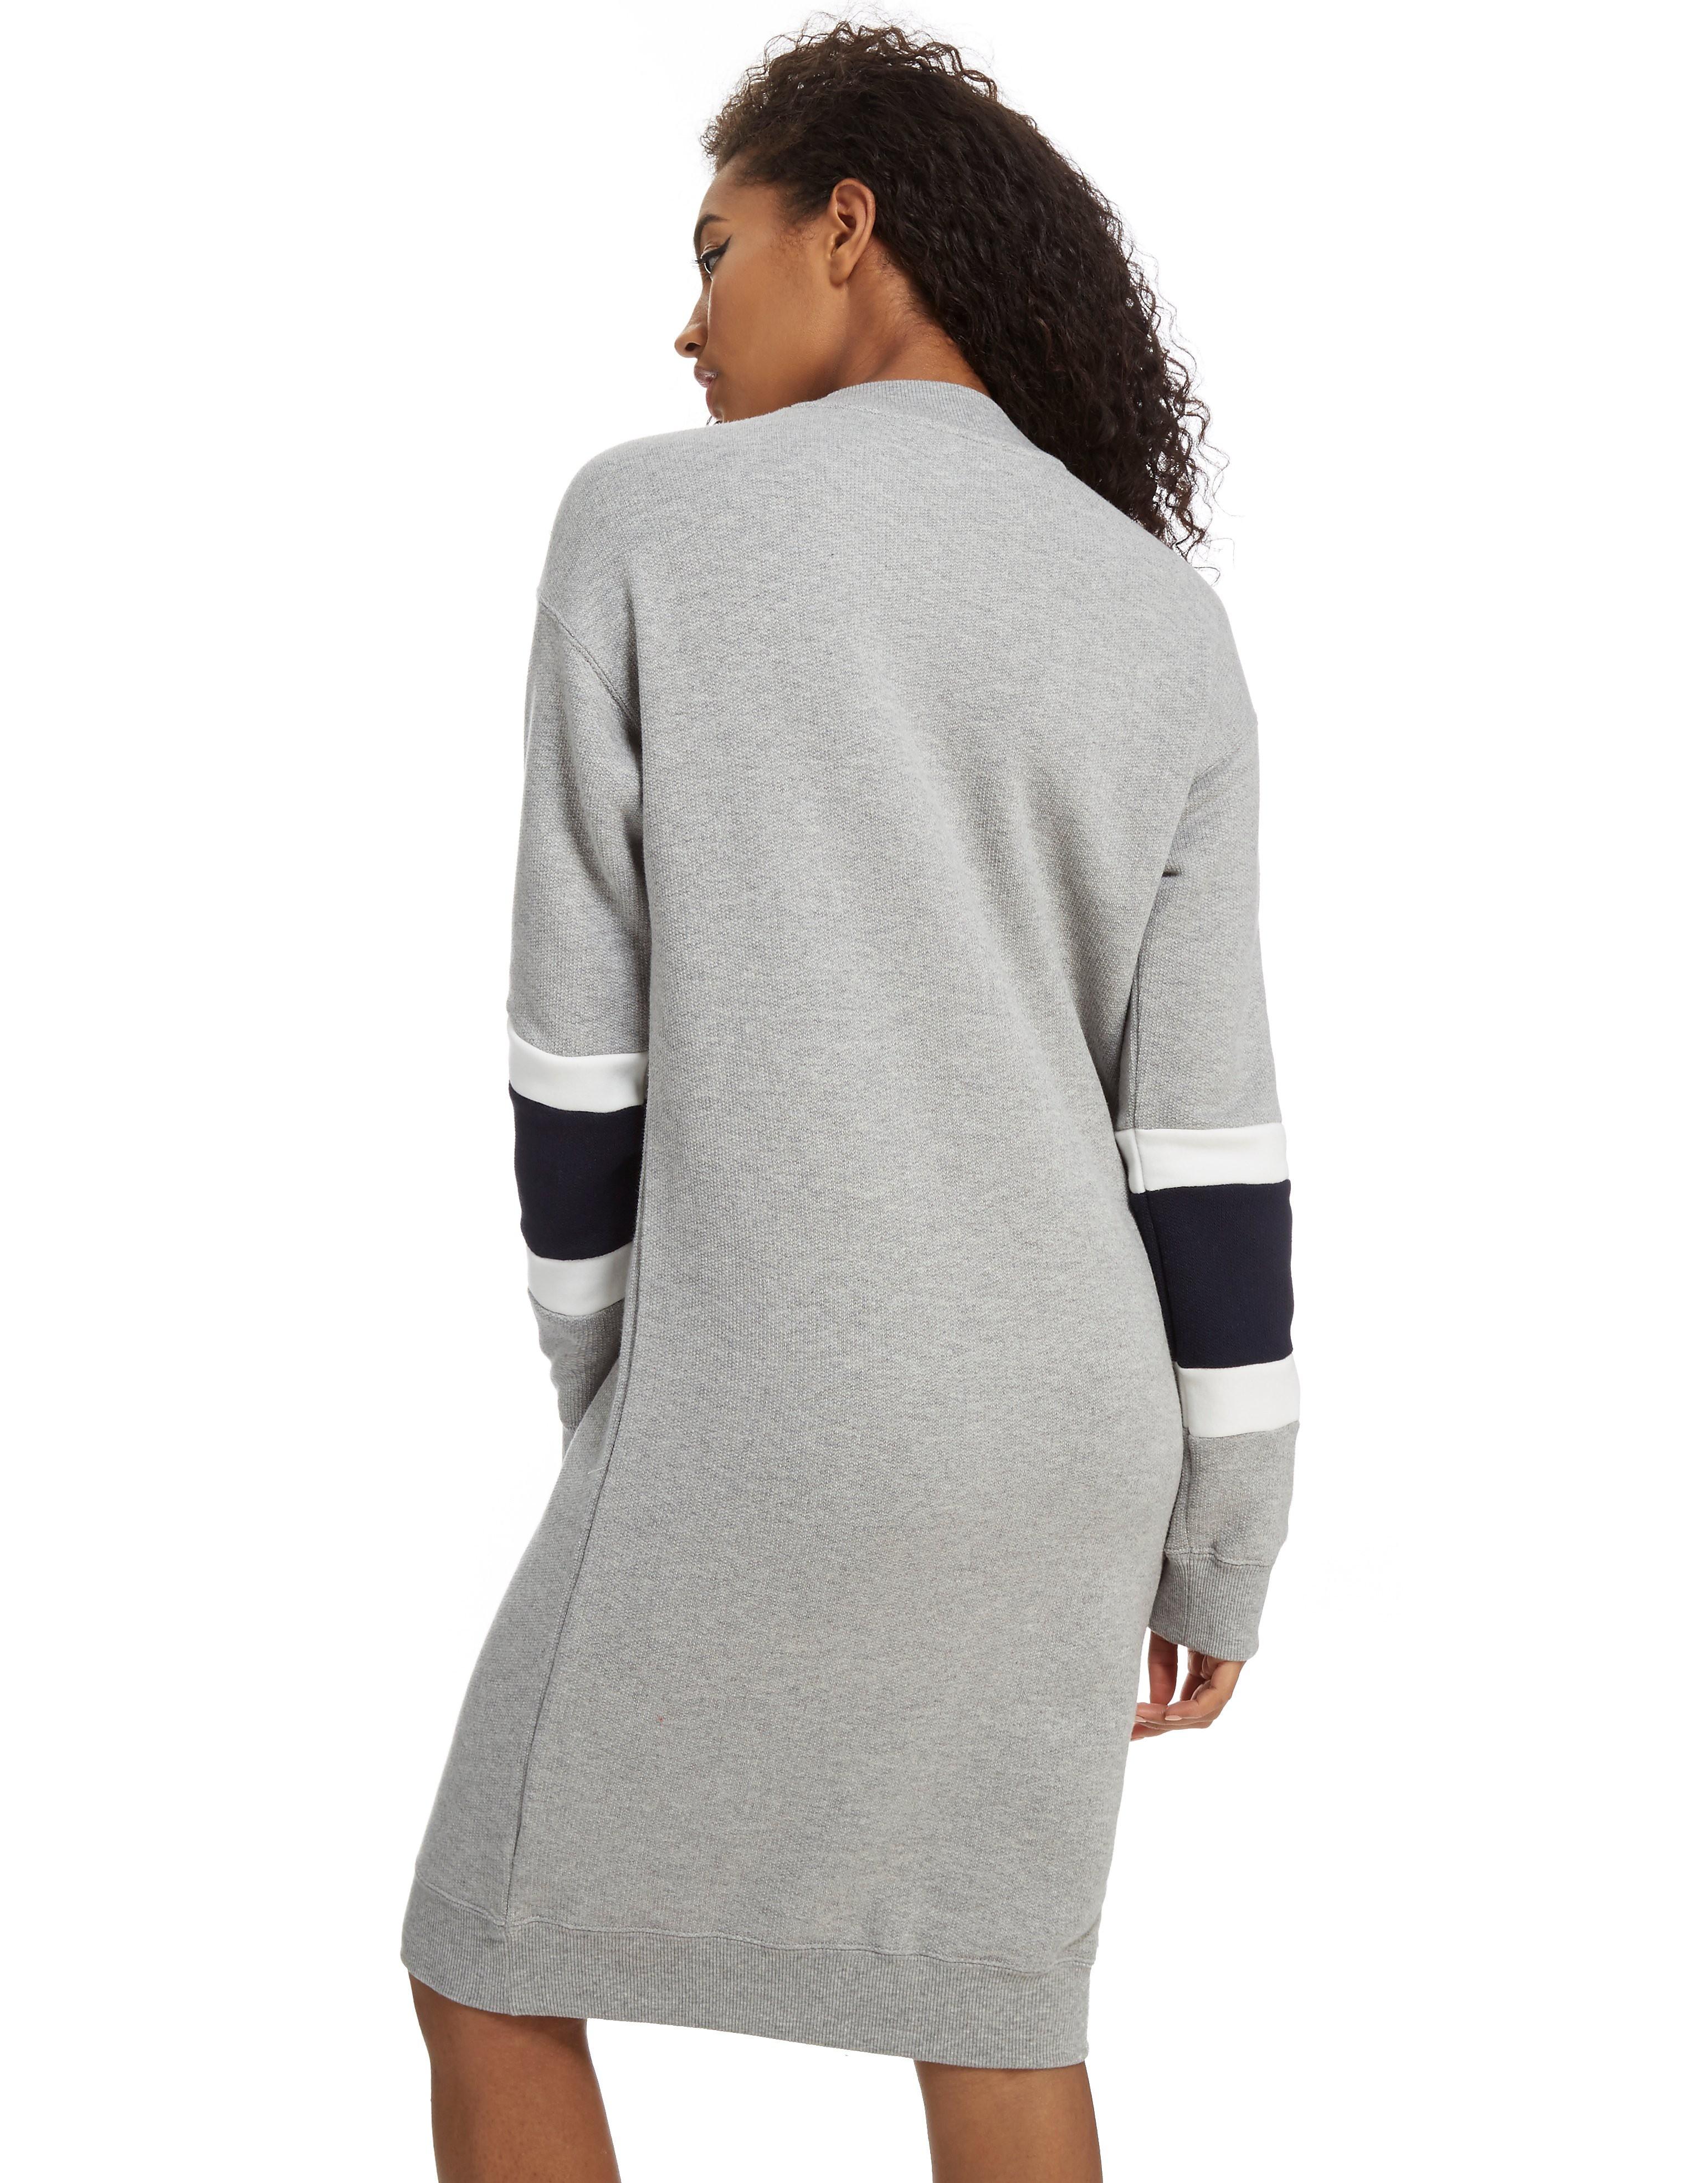 adidas Originals High Neck Sweater Dress